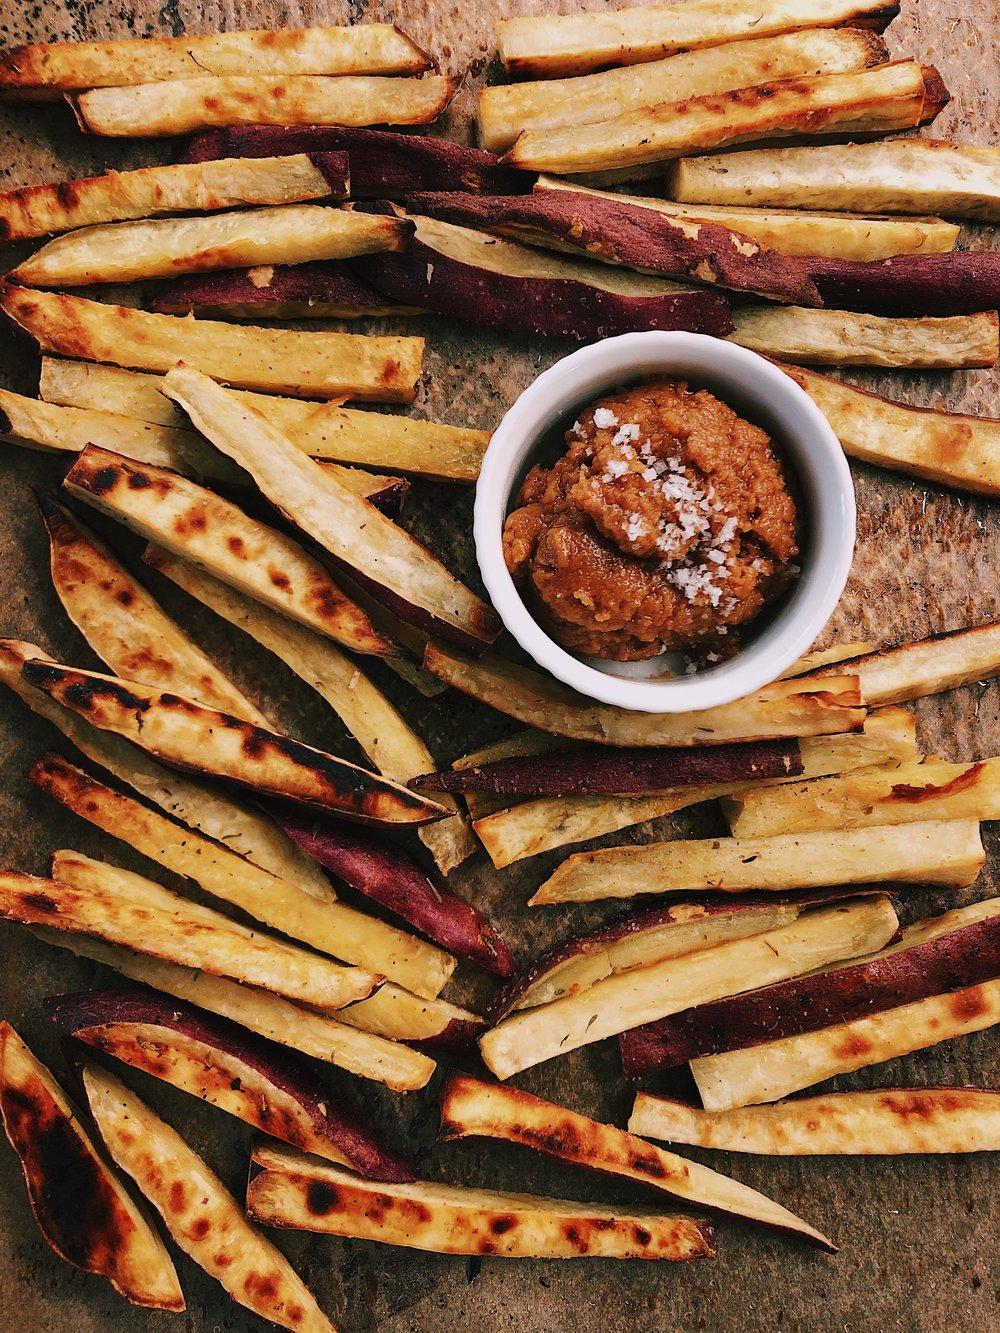 japanese sweet potato oven fries by kalejunkie